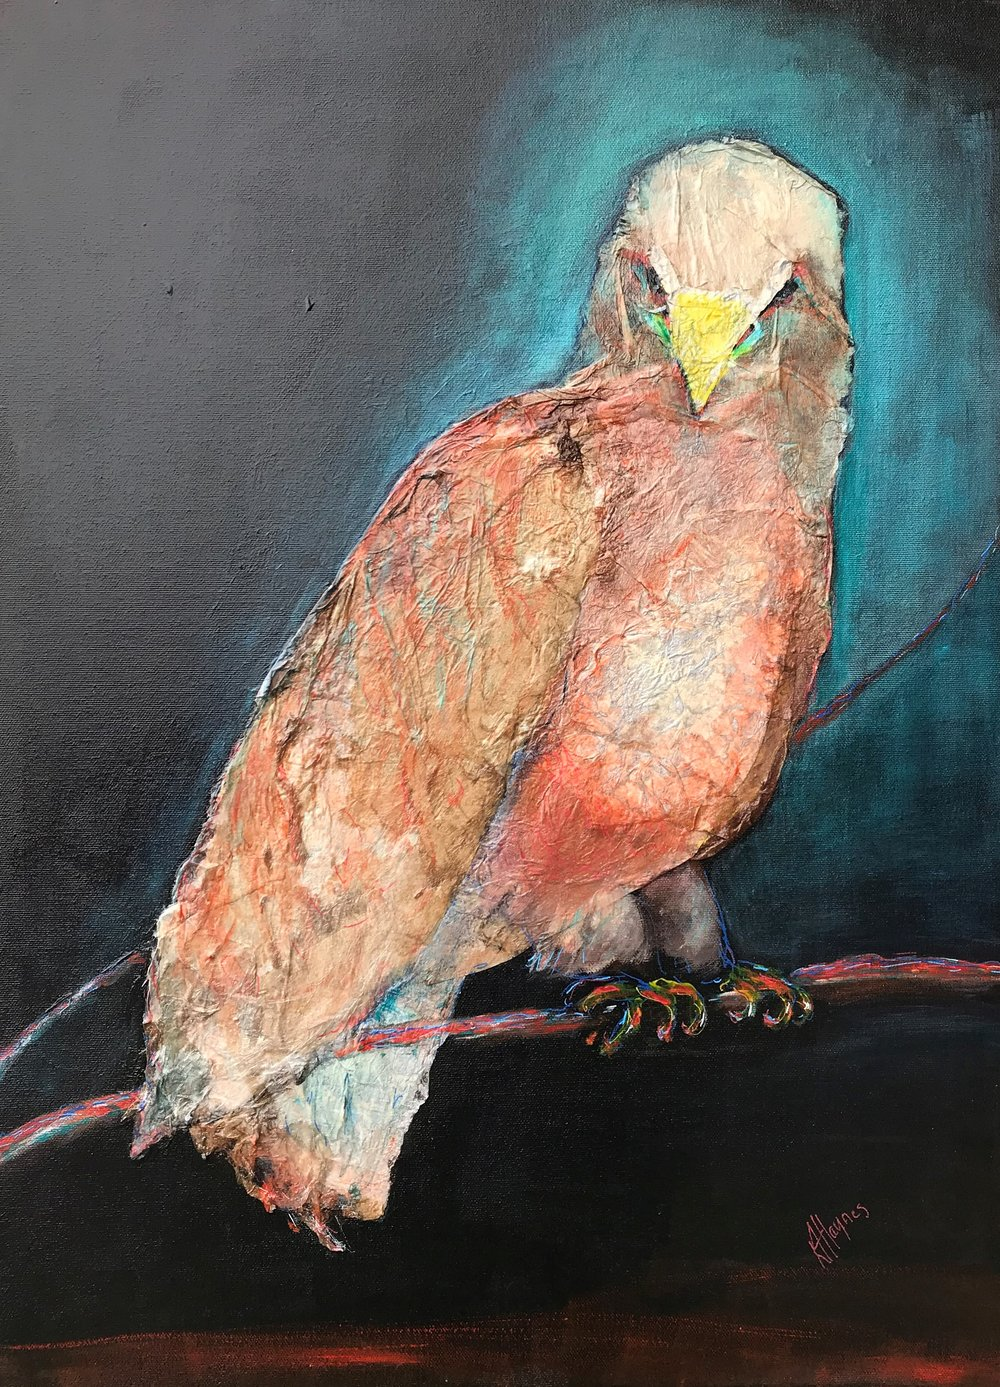 "Avian Authority   24"" x 18"" - mixed media on canvas  currently at Teichert Gallery (teichertgallery.ca), Art Gallery of Nova Scotia"